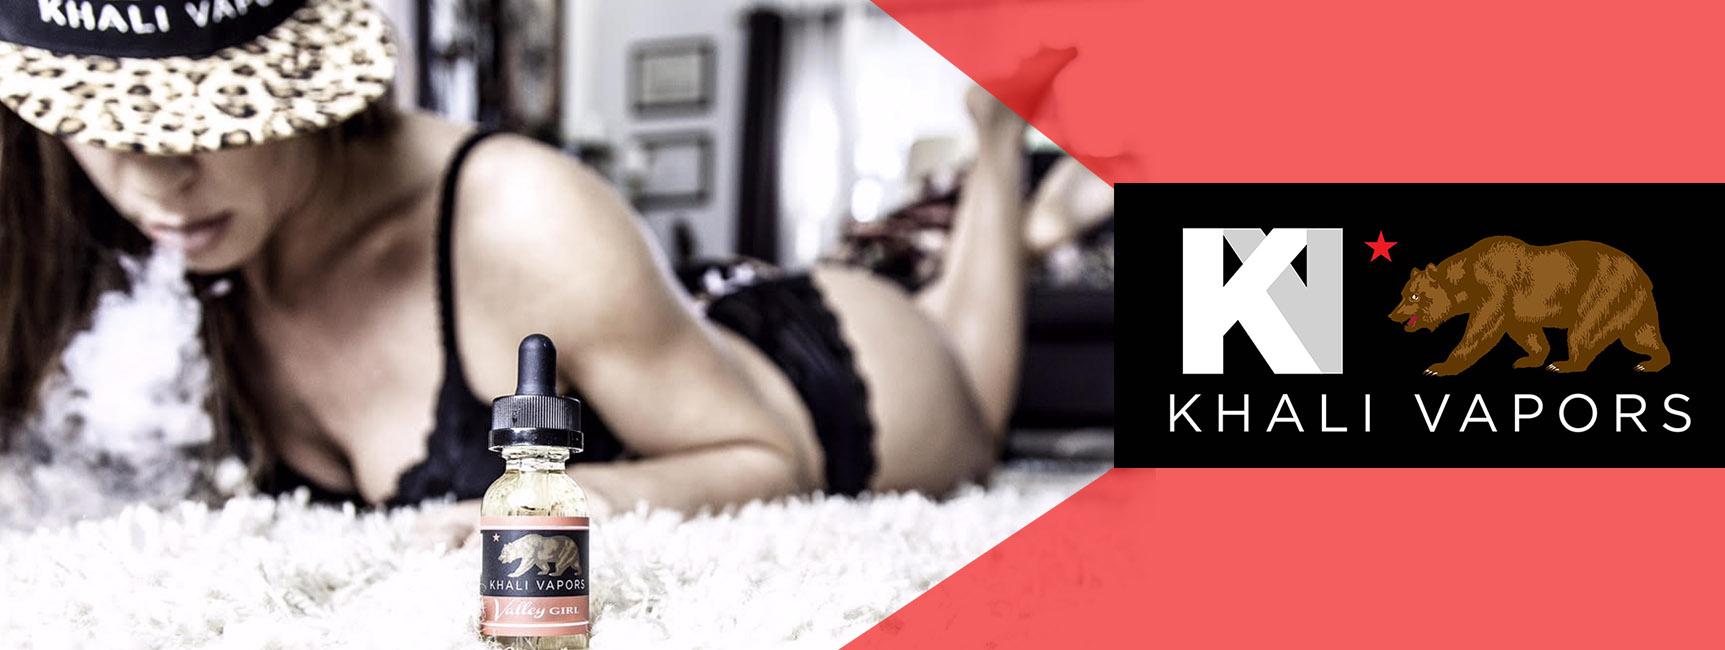 khali-vapors-eliquid-ejuice-vape-category-banner.png